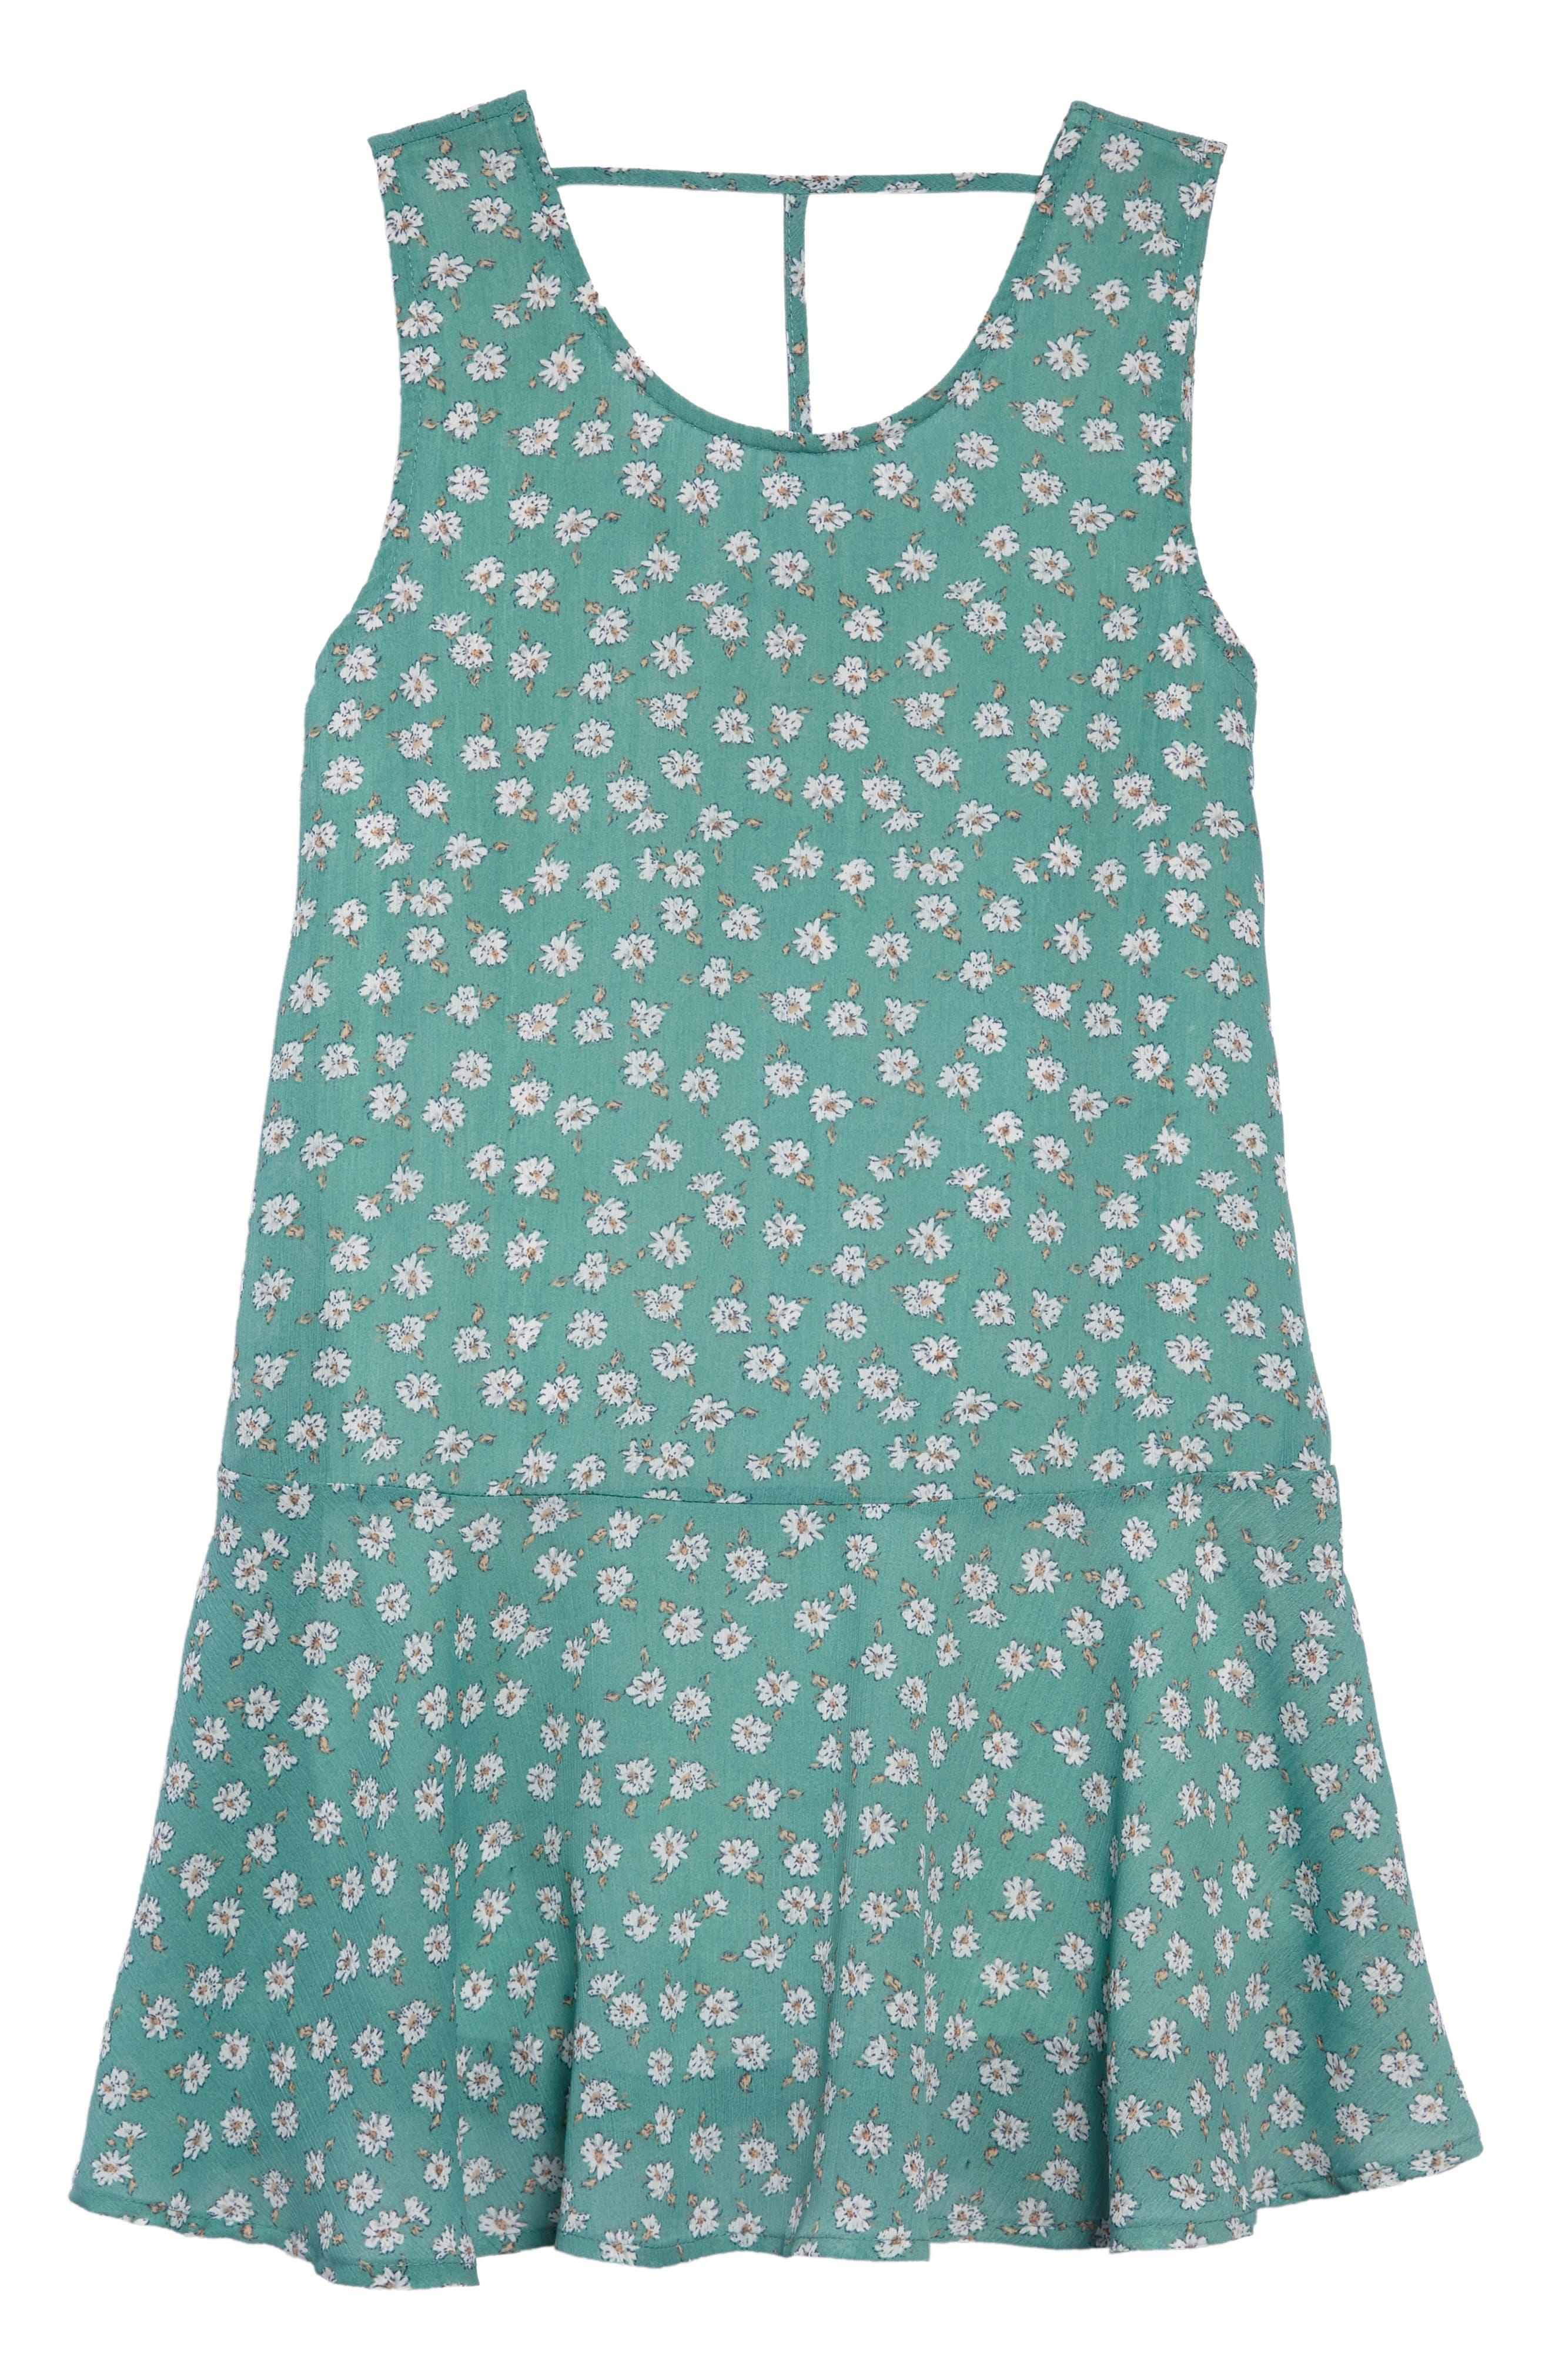 Brooklyn Floral Drop Waist Dress,                             Main thumbnail 1, color,                             Mint